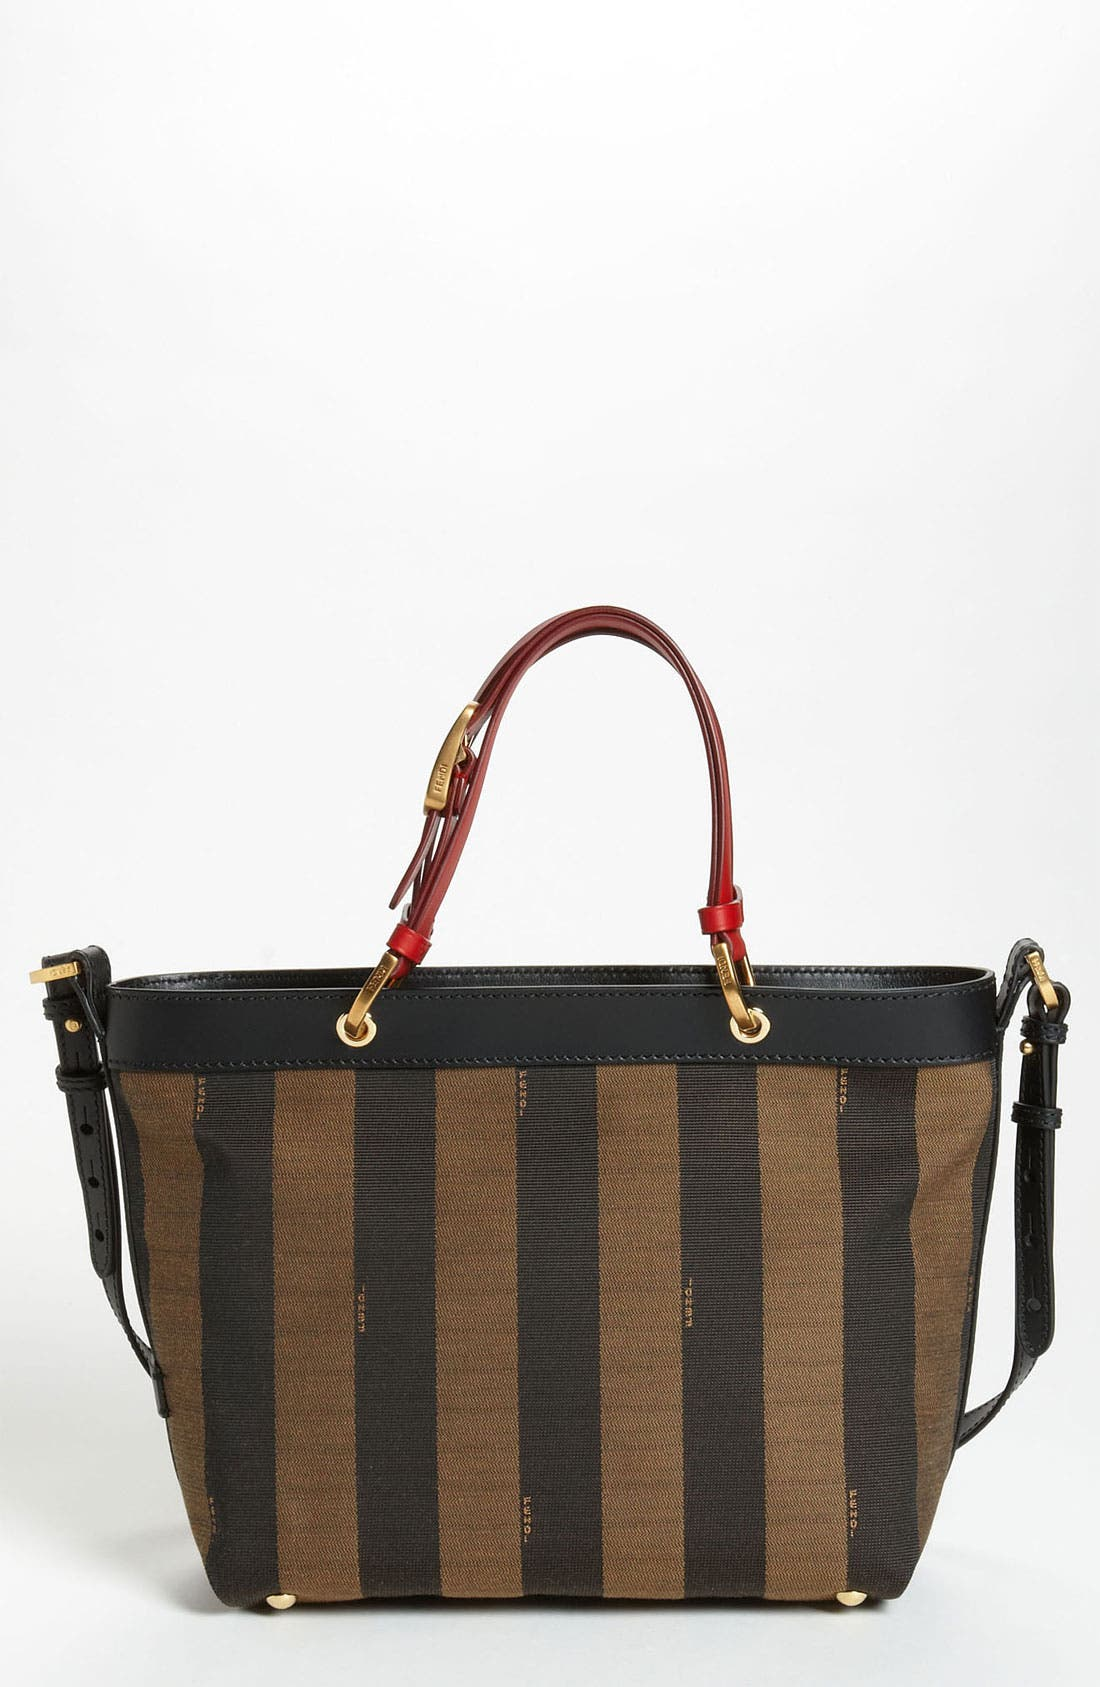 Alternate Image 1 Selected - Fendi 'Small Pequin' Shoulder Bag